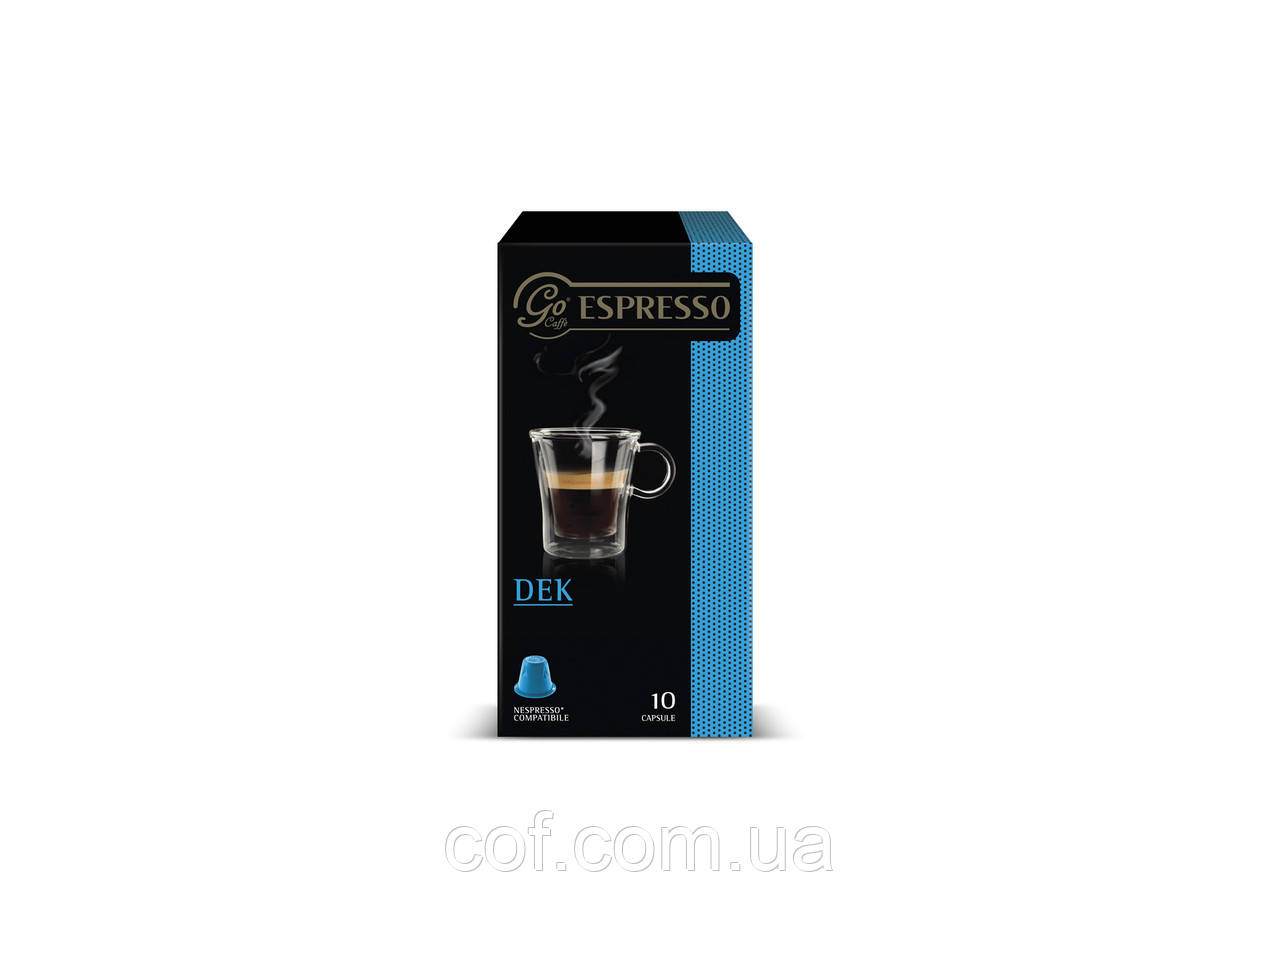 Кофе капсульный Go Caffe Espresso Dek (Nespresso) 10шт